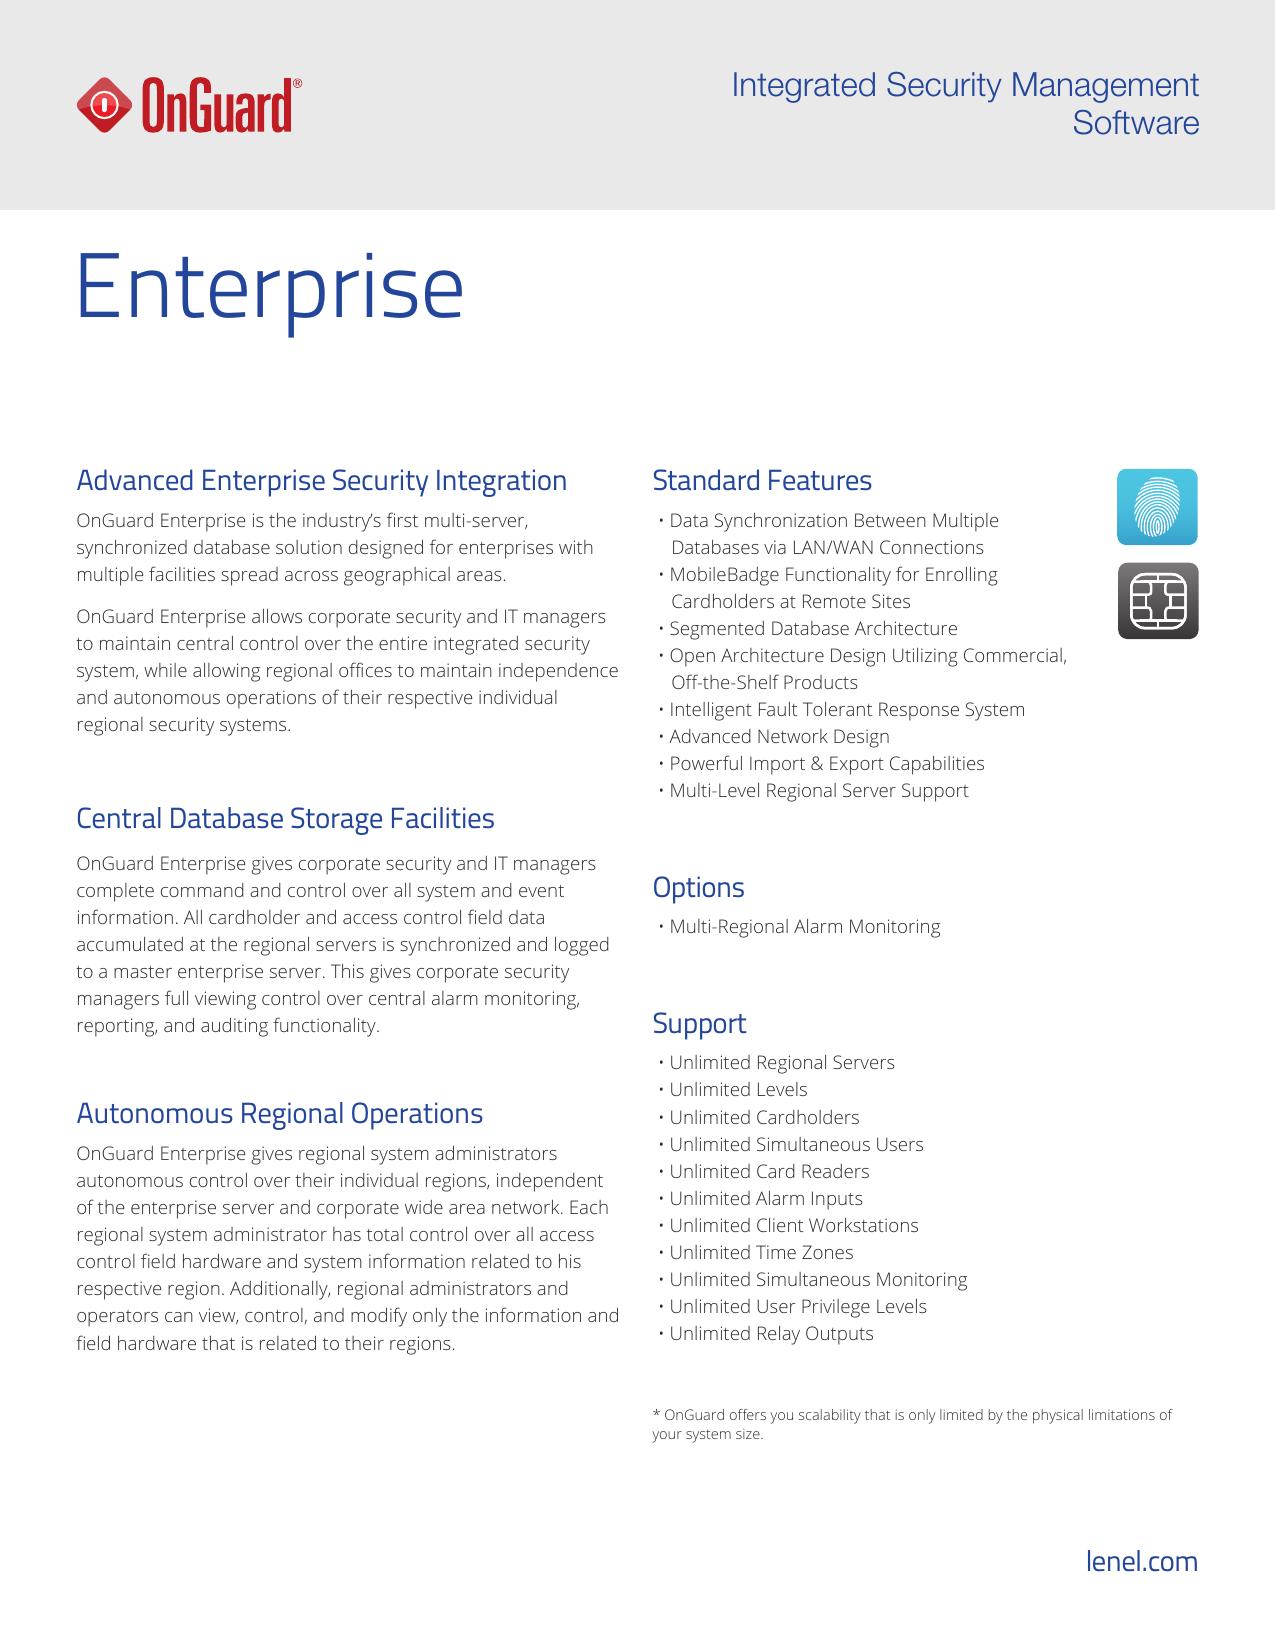 Enterprise Lenelcom Database Access Control And Security